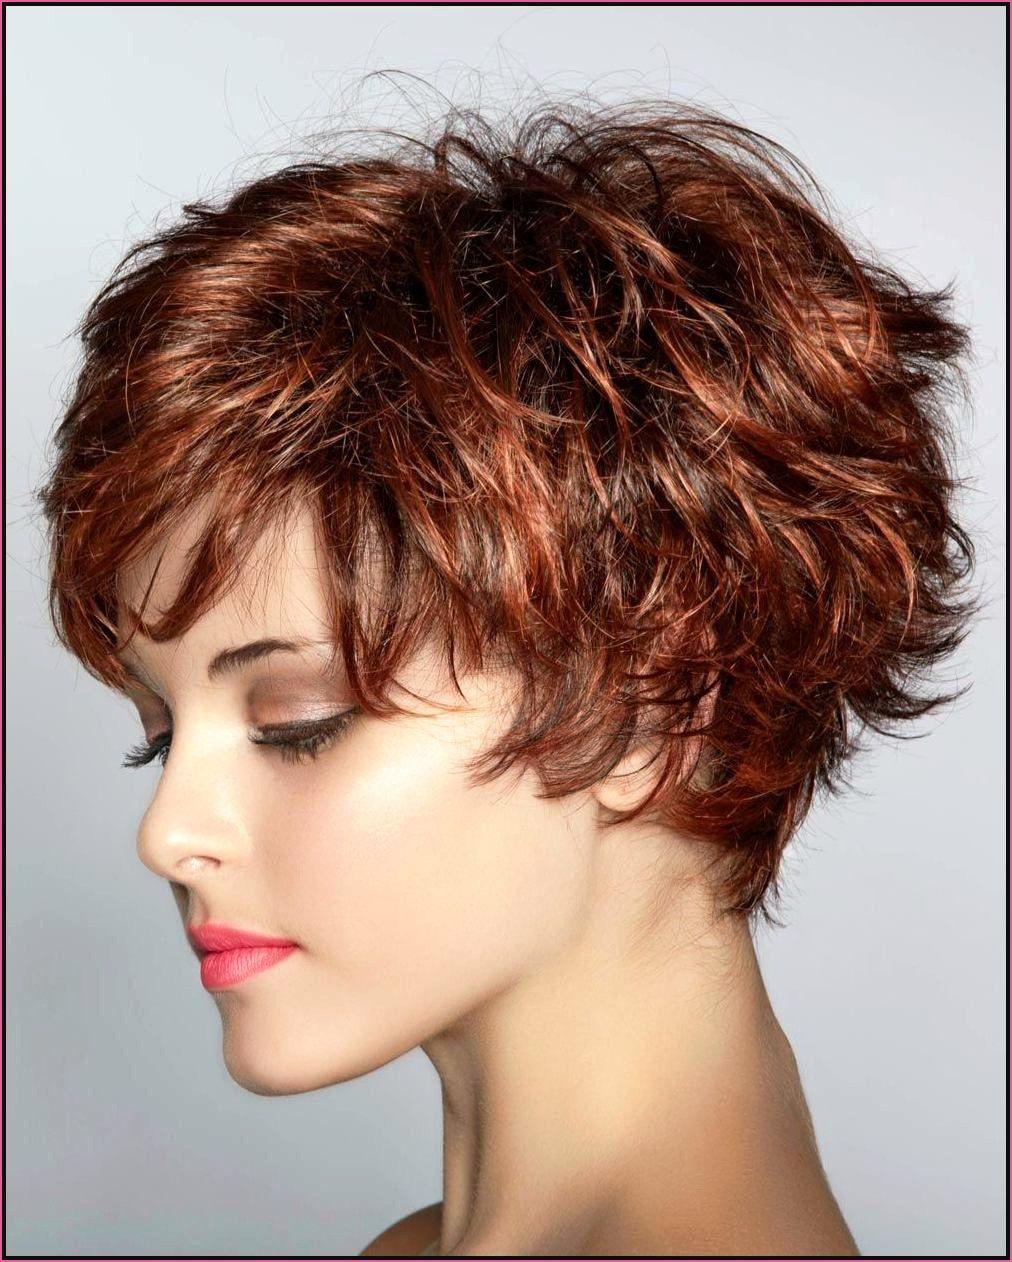 Trendfrisur Statt Bob Tragen Wir Jetzt Den Tob Trendfrisuren Frisuren Haare Pflegen